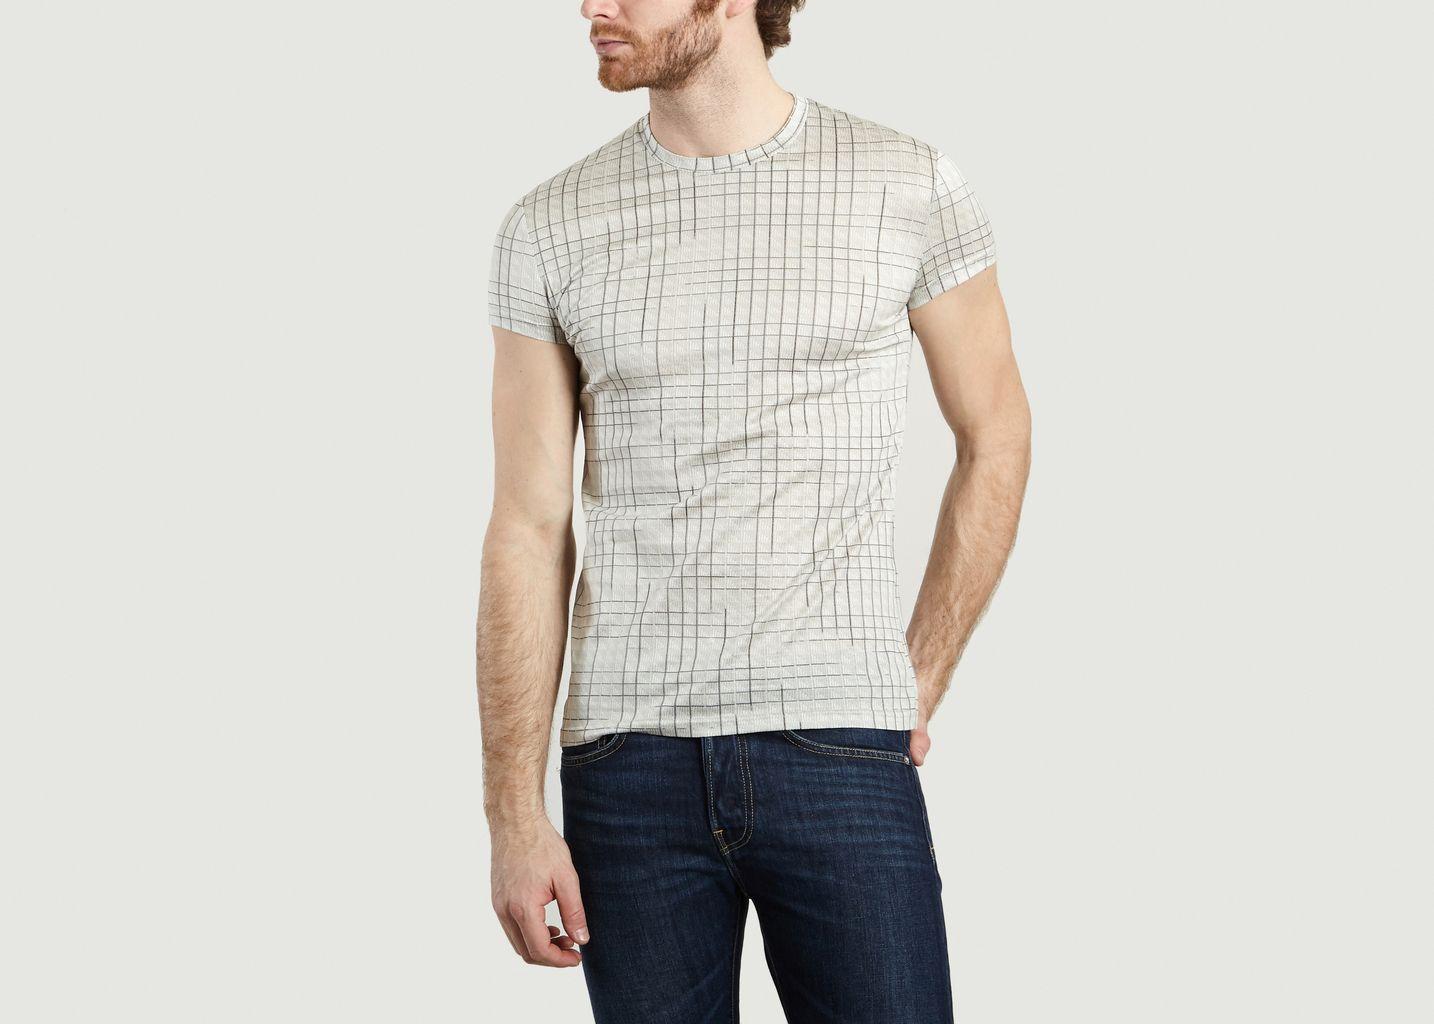 T-Shirt Basic Carreaux - Sébastien Blondin